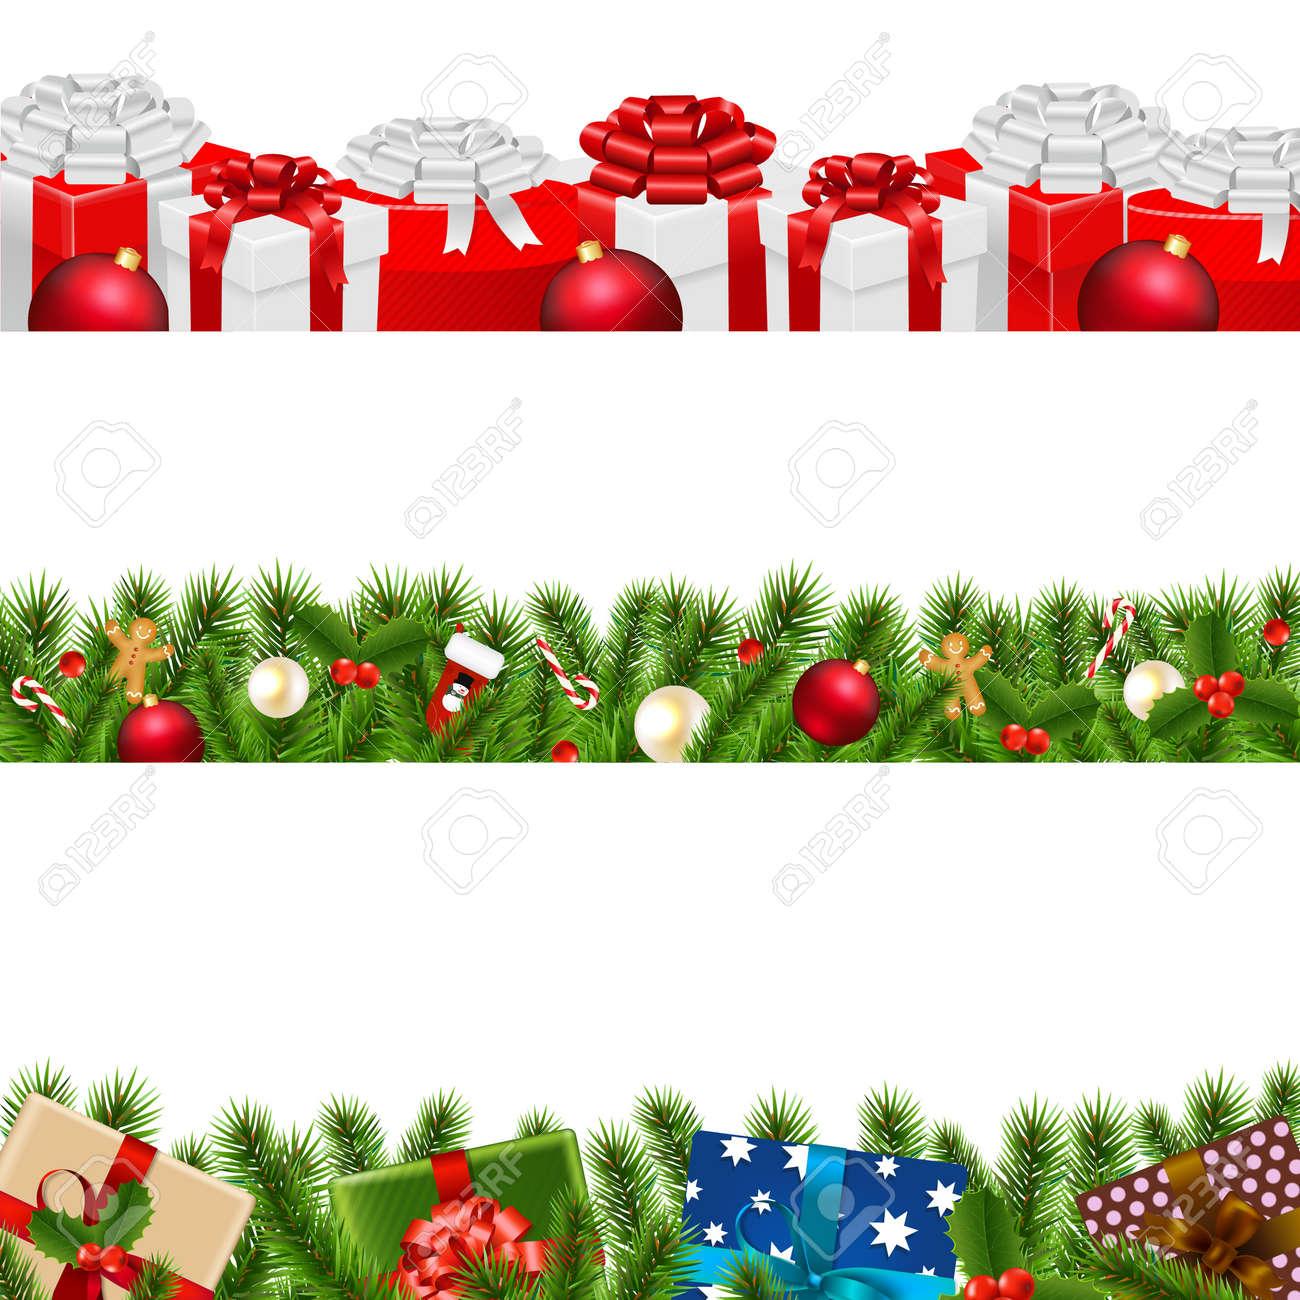 Christmas Borders Big Set With Gradient Mesh, Vector Illustration - 48542475